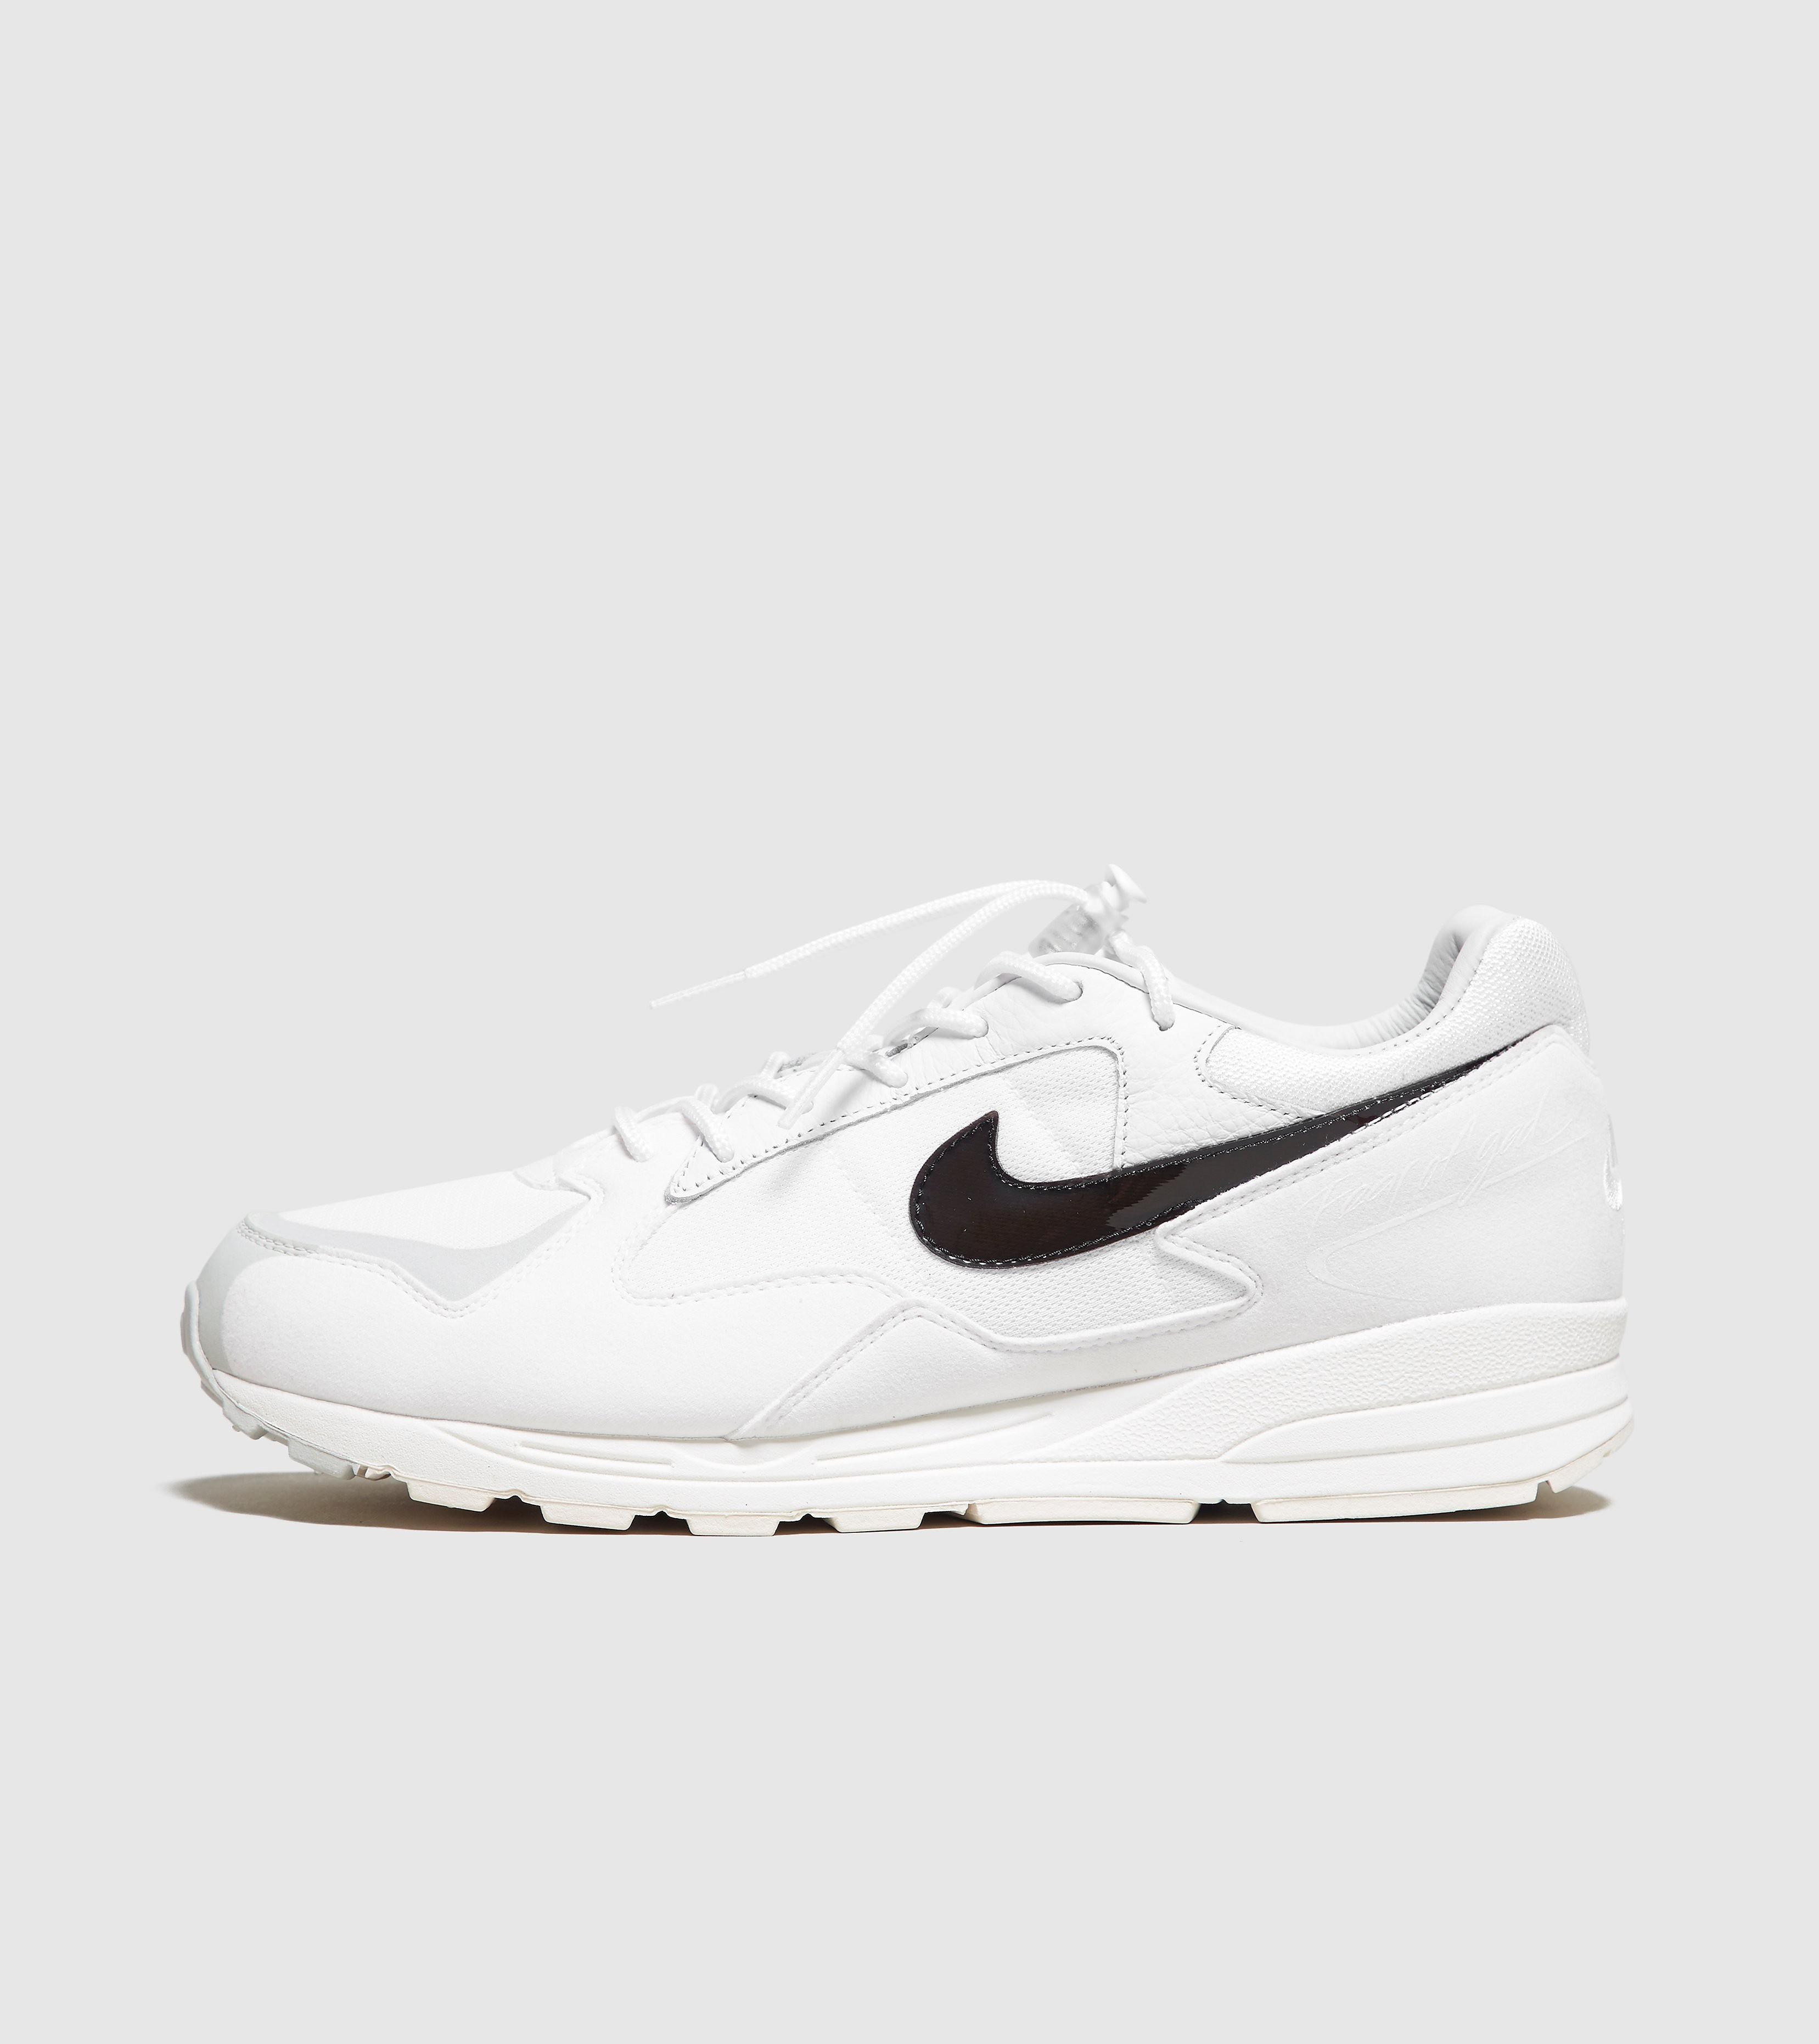 Nike x Fear Of God Skylon II